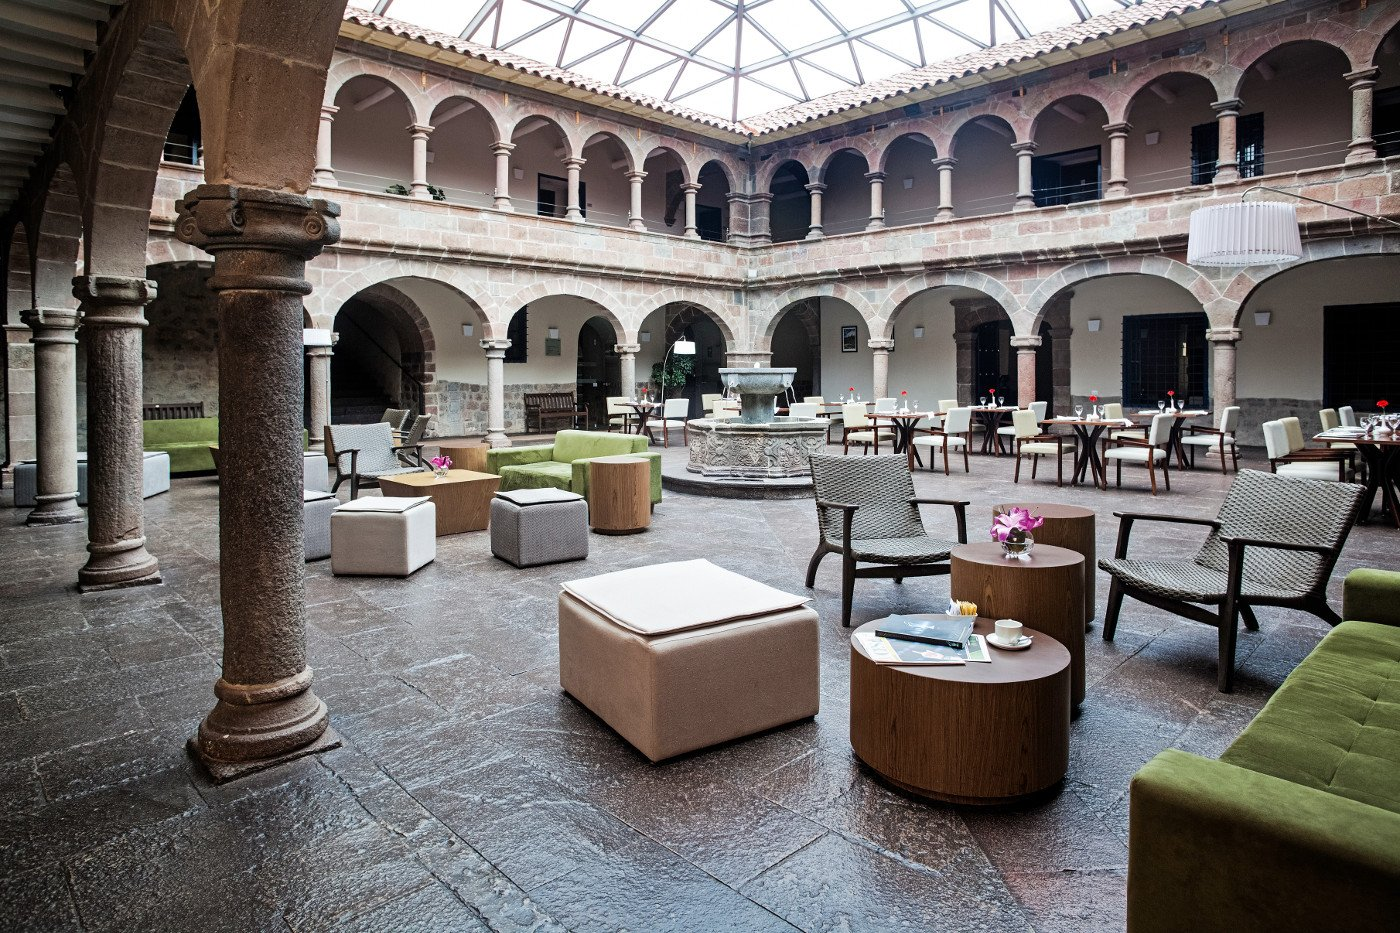 Südamerika_Cusco Hotel_2015